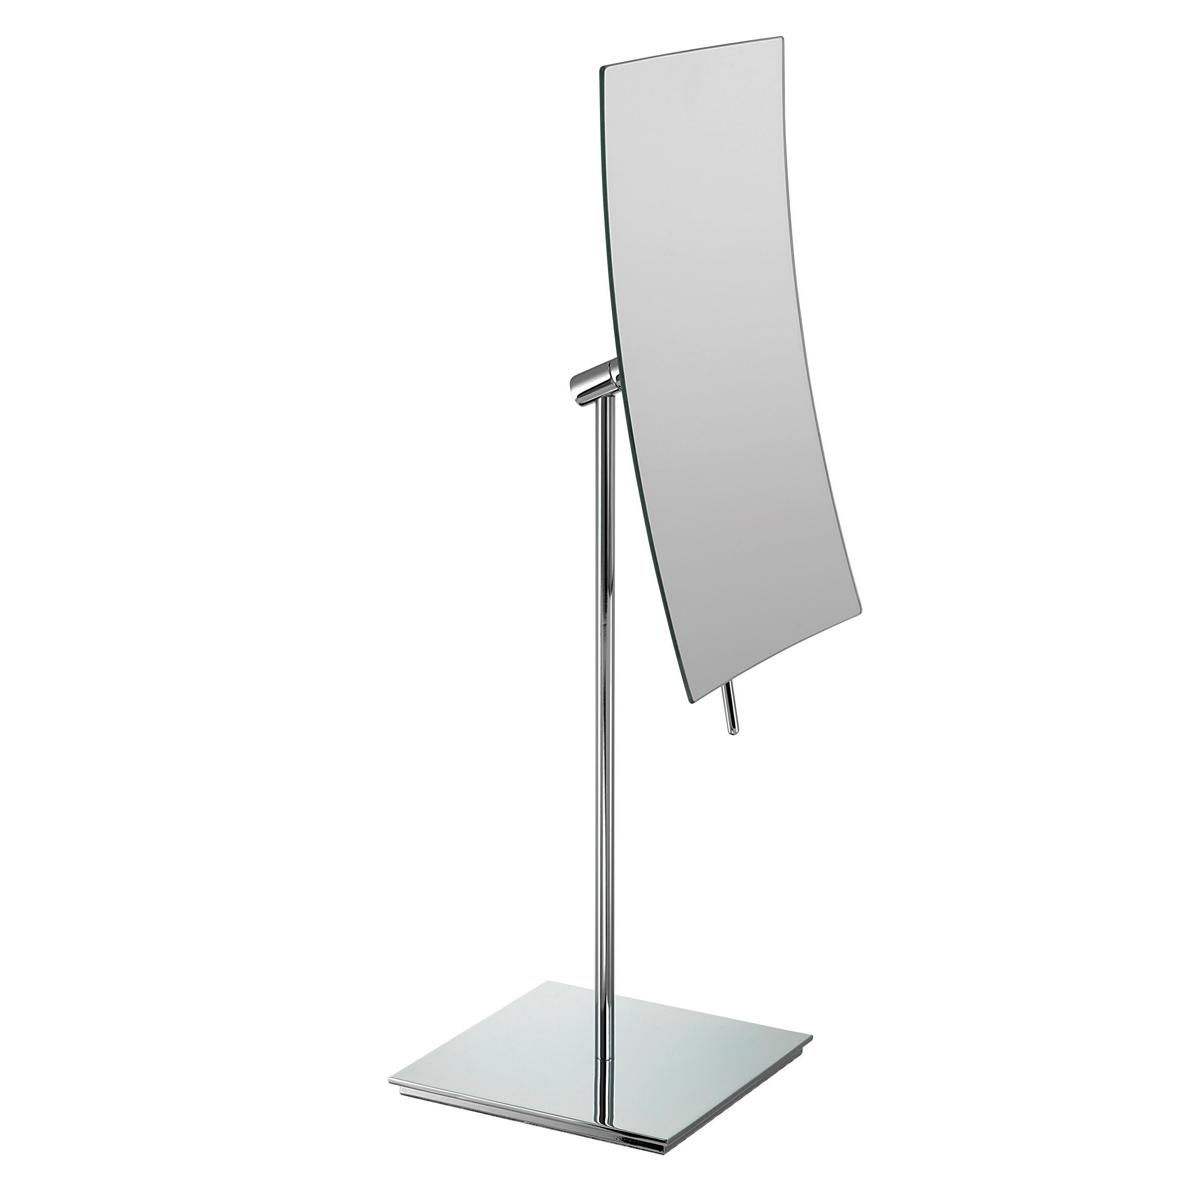 1200 155 24 chr a - Mirror Pedestal 3x Magnification Rimless 'Topaz' - 155/24